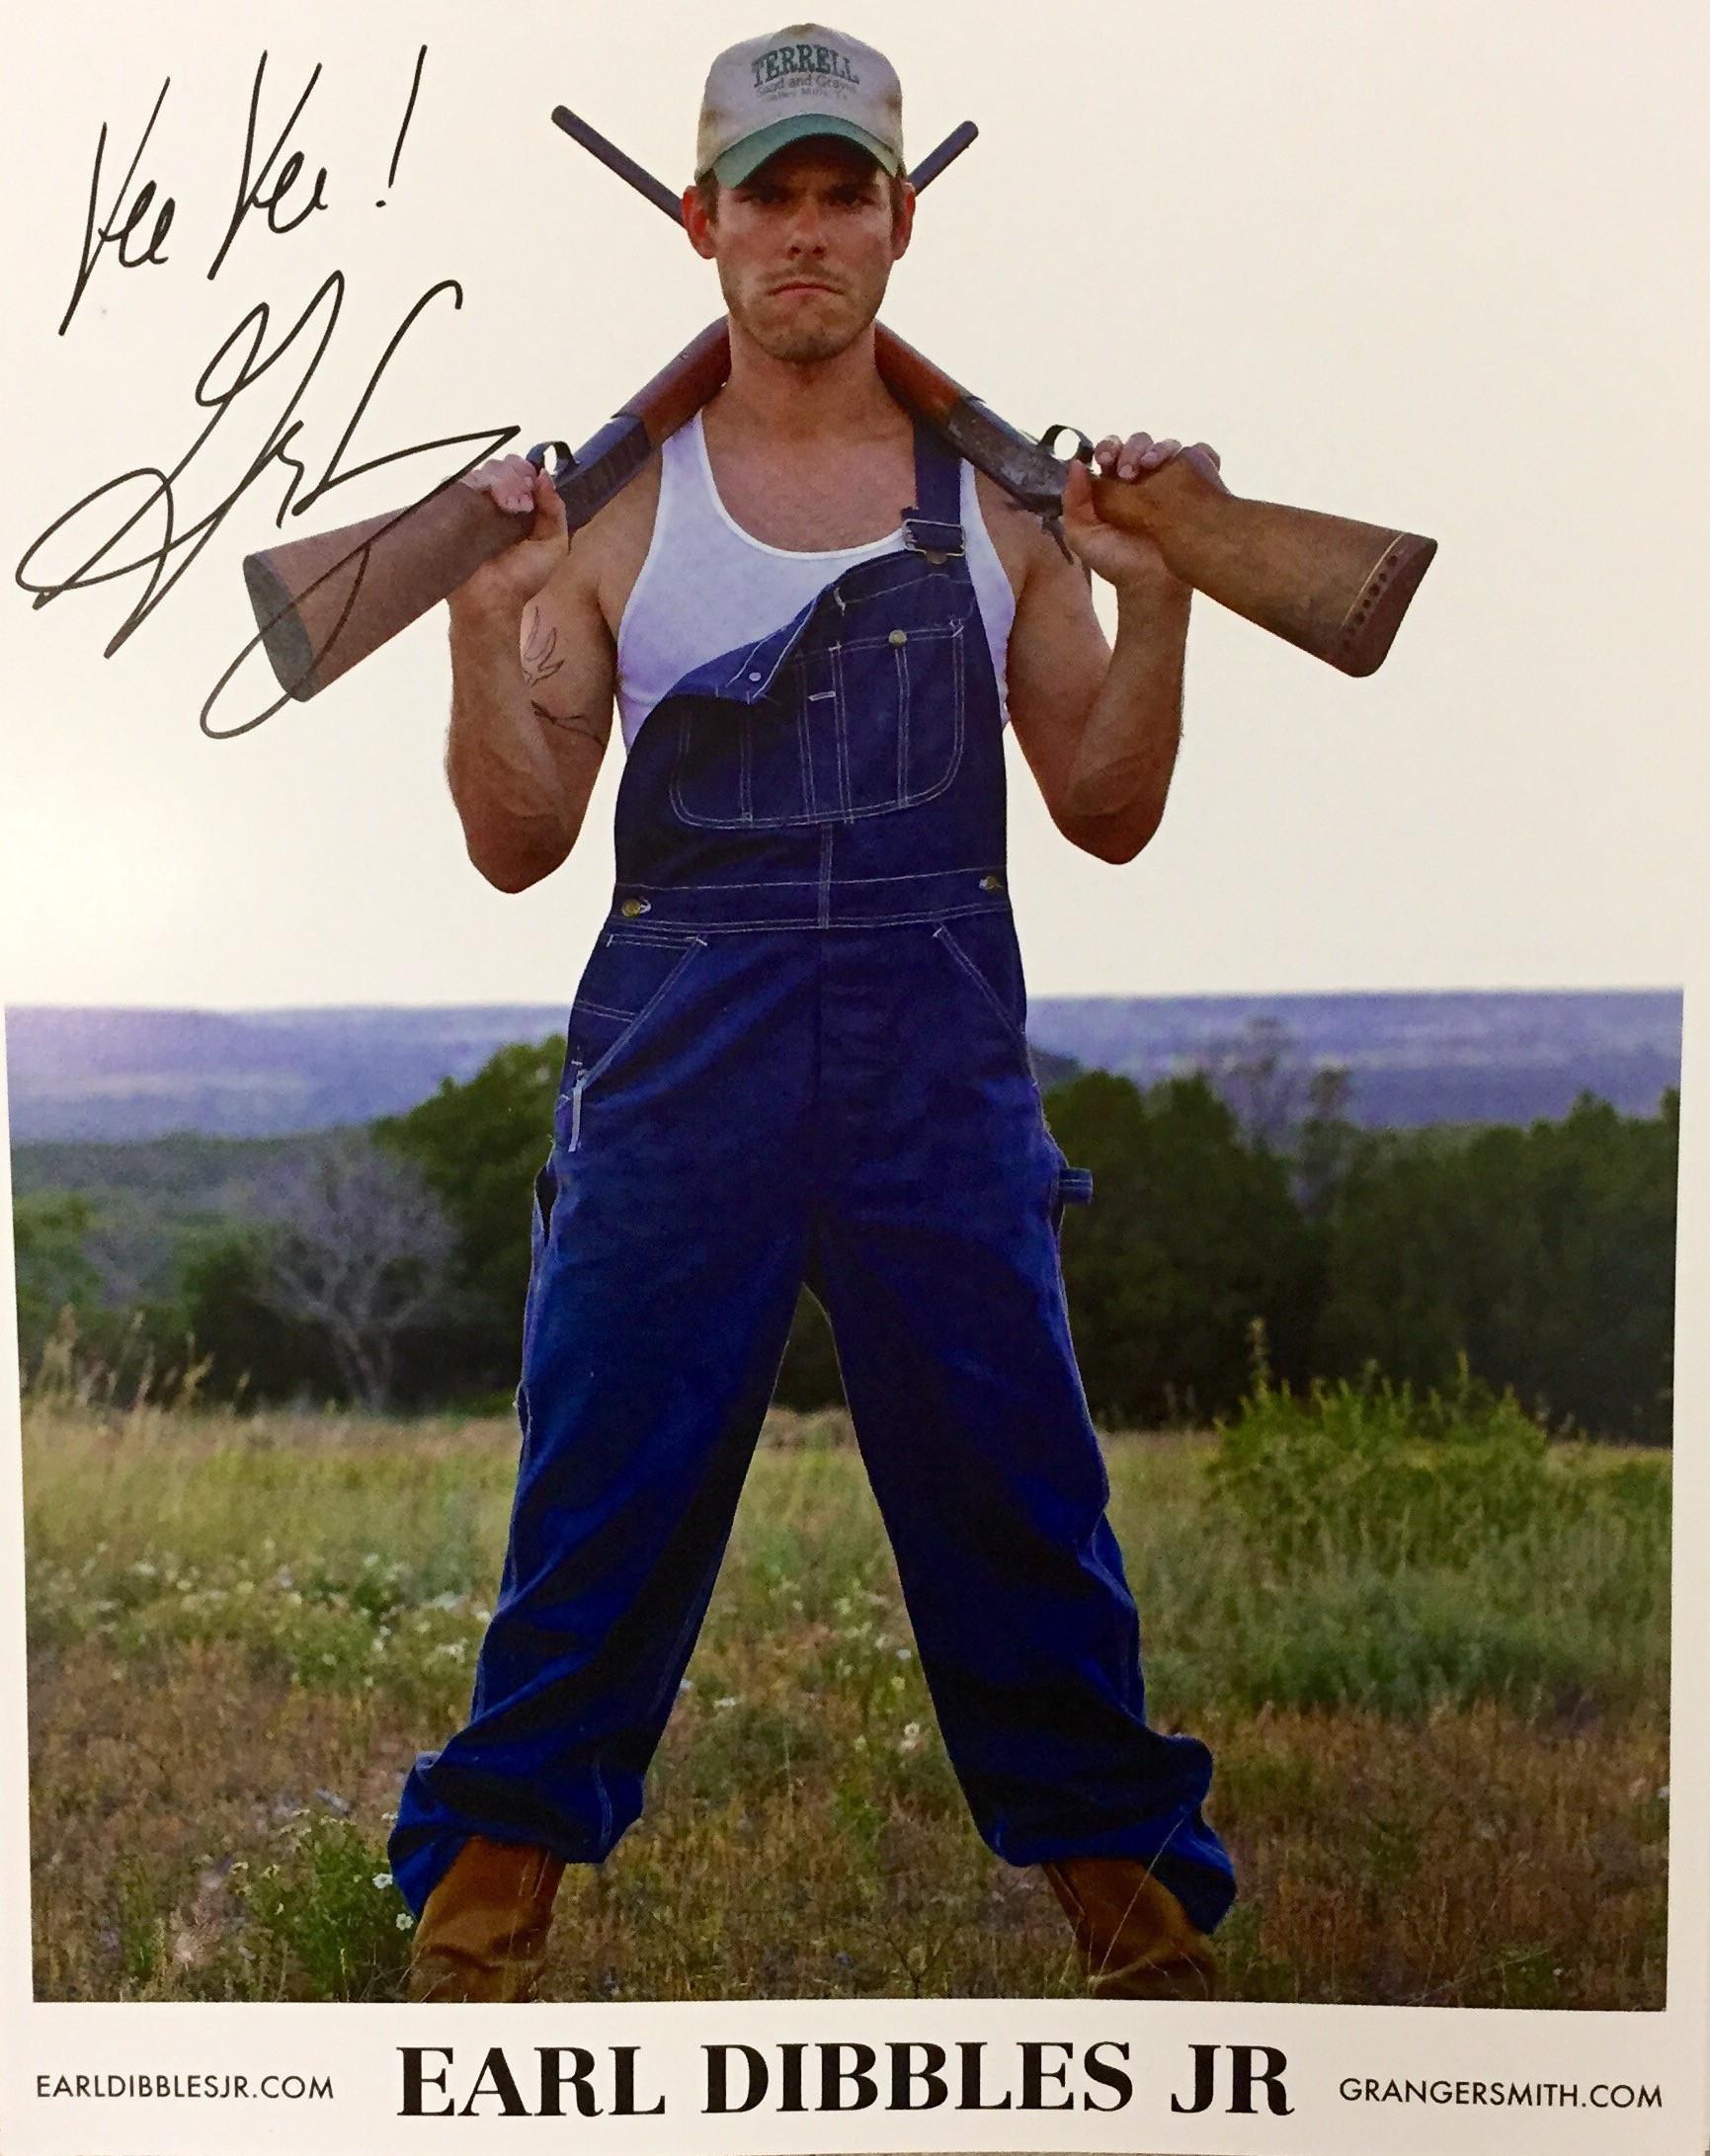 Earl Dibbles Jr 8x10 poster (signed)